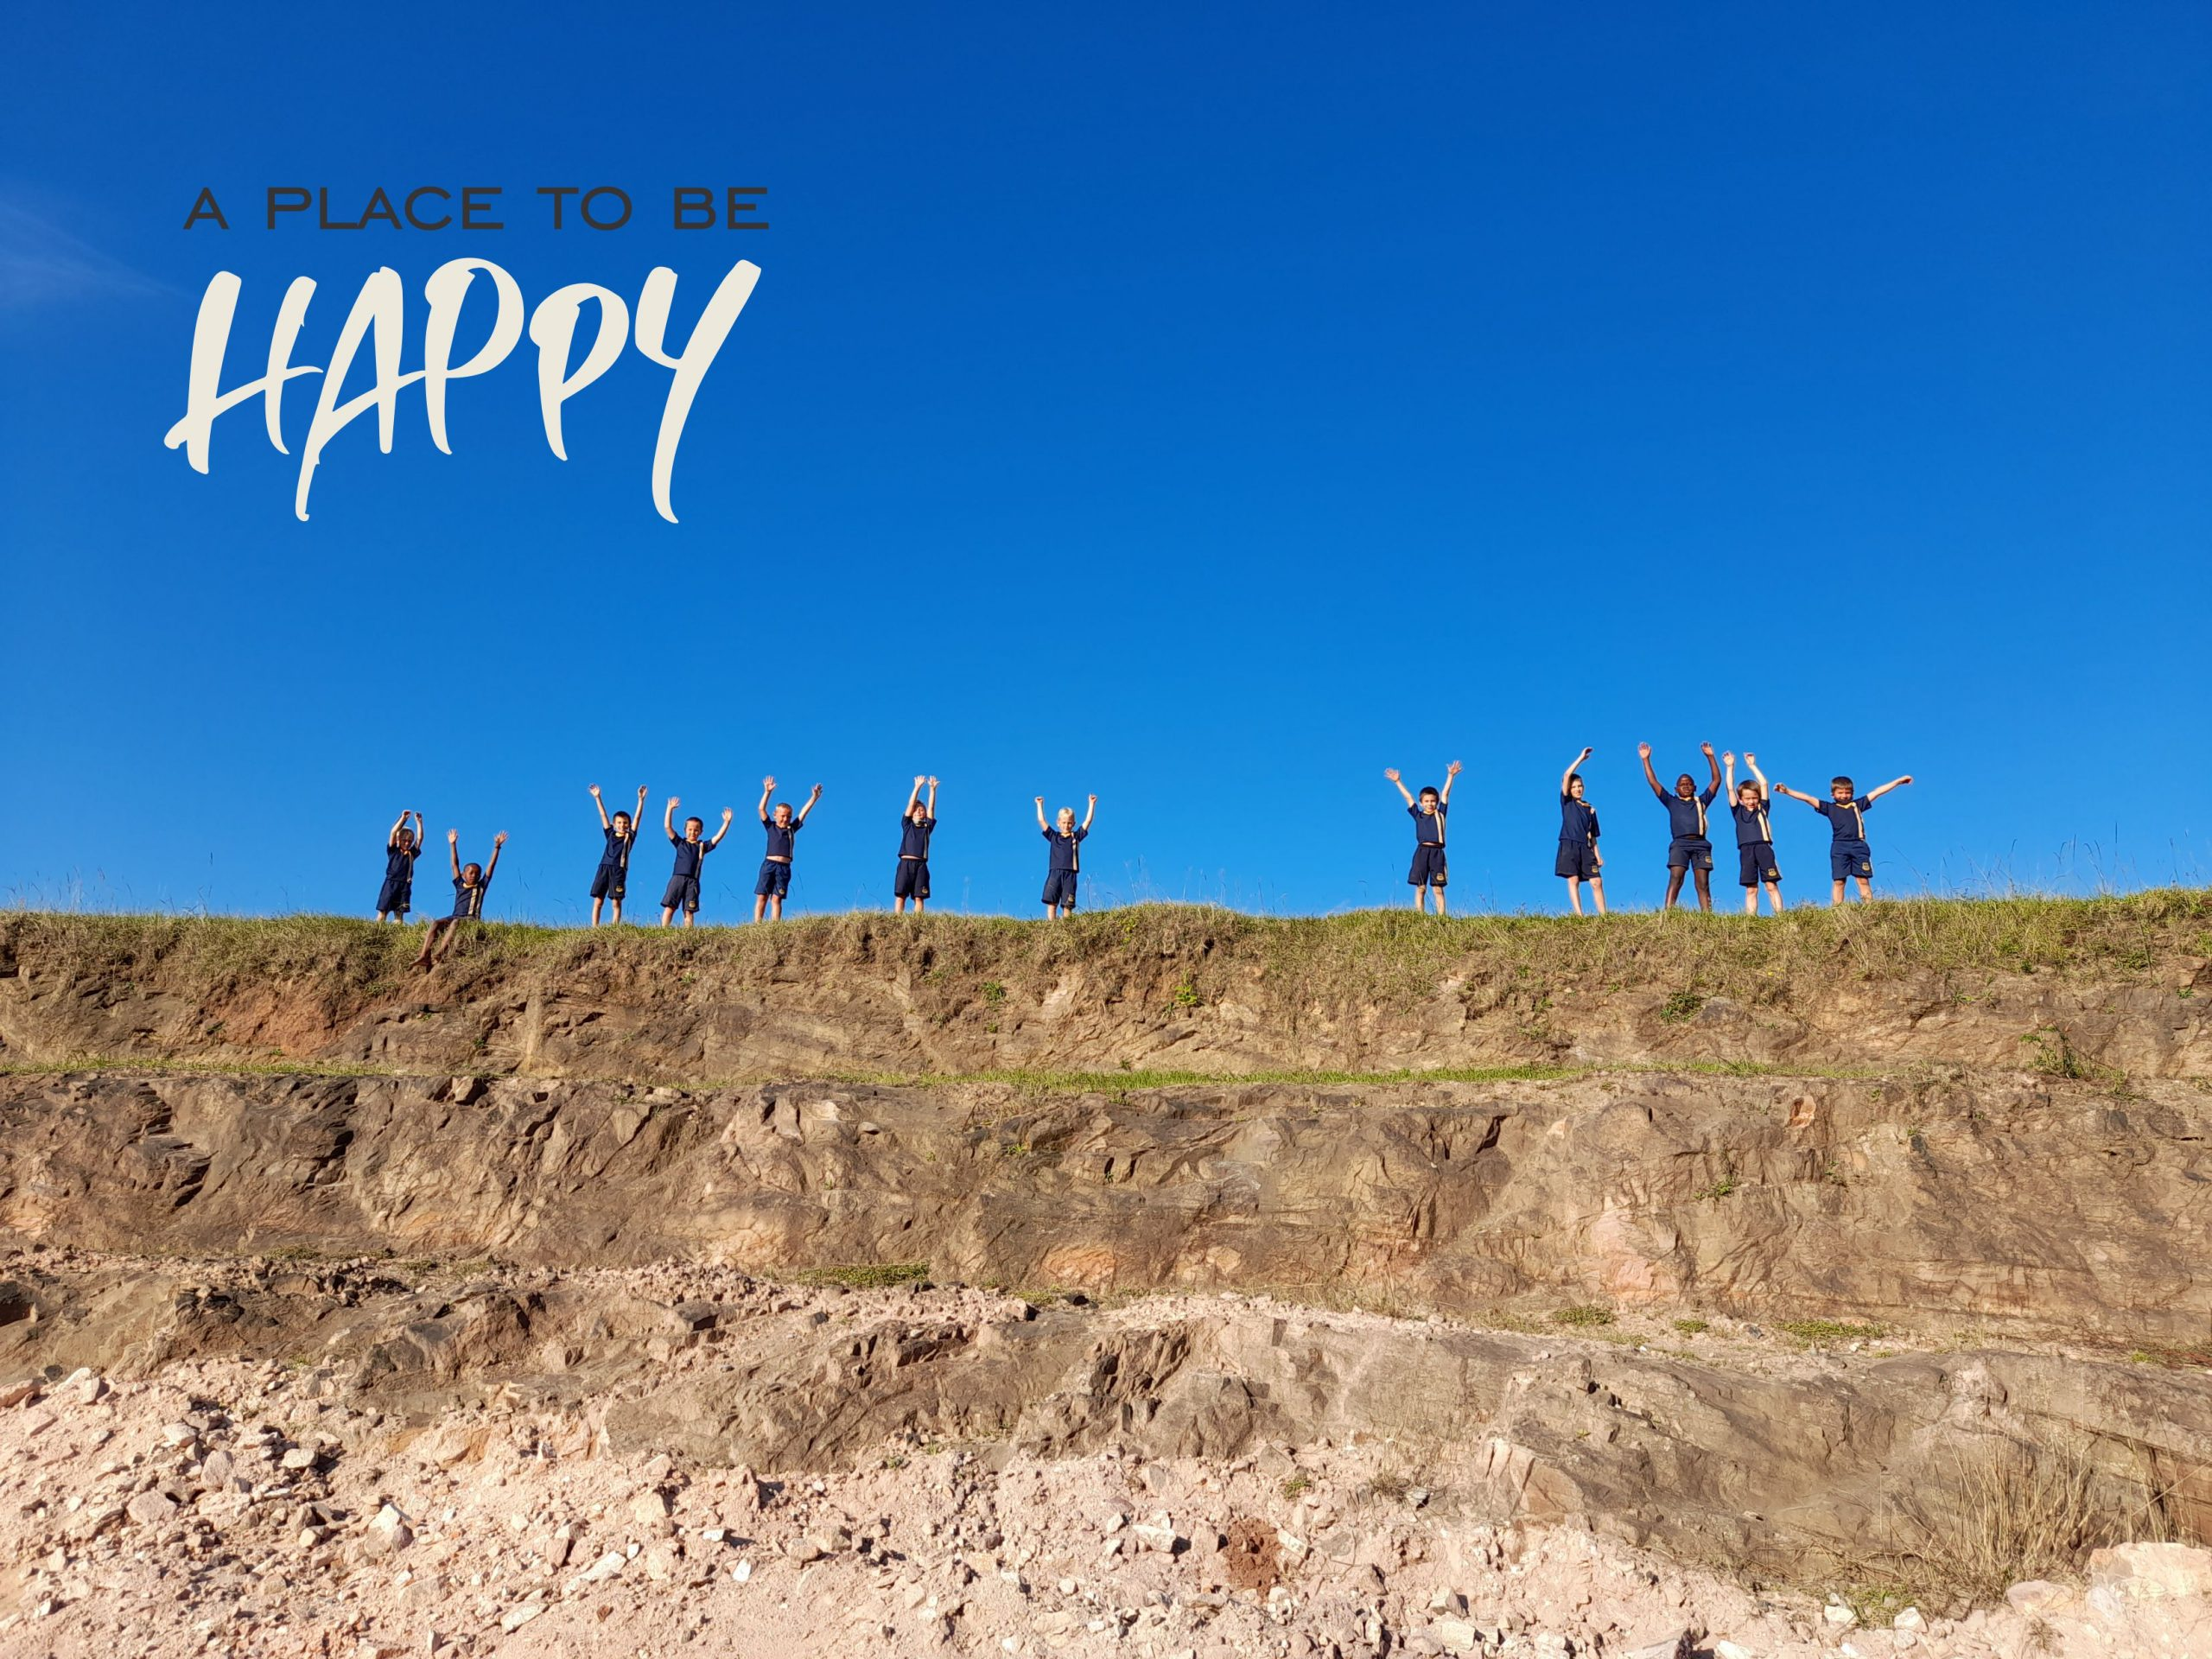 Happy place2